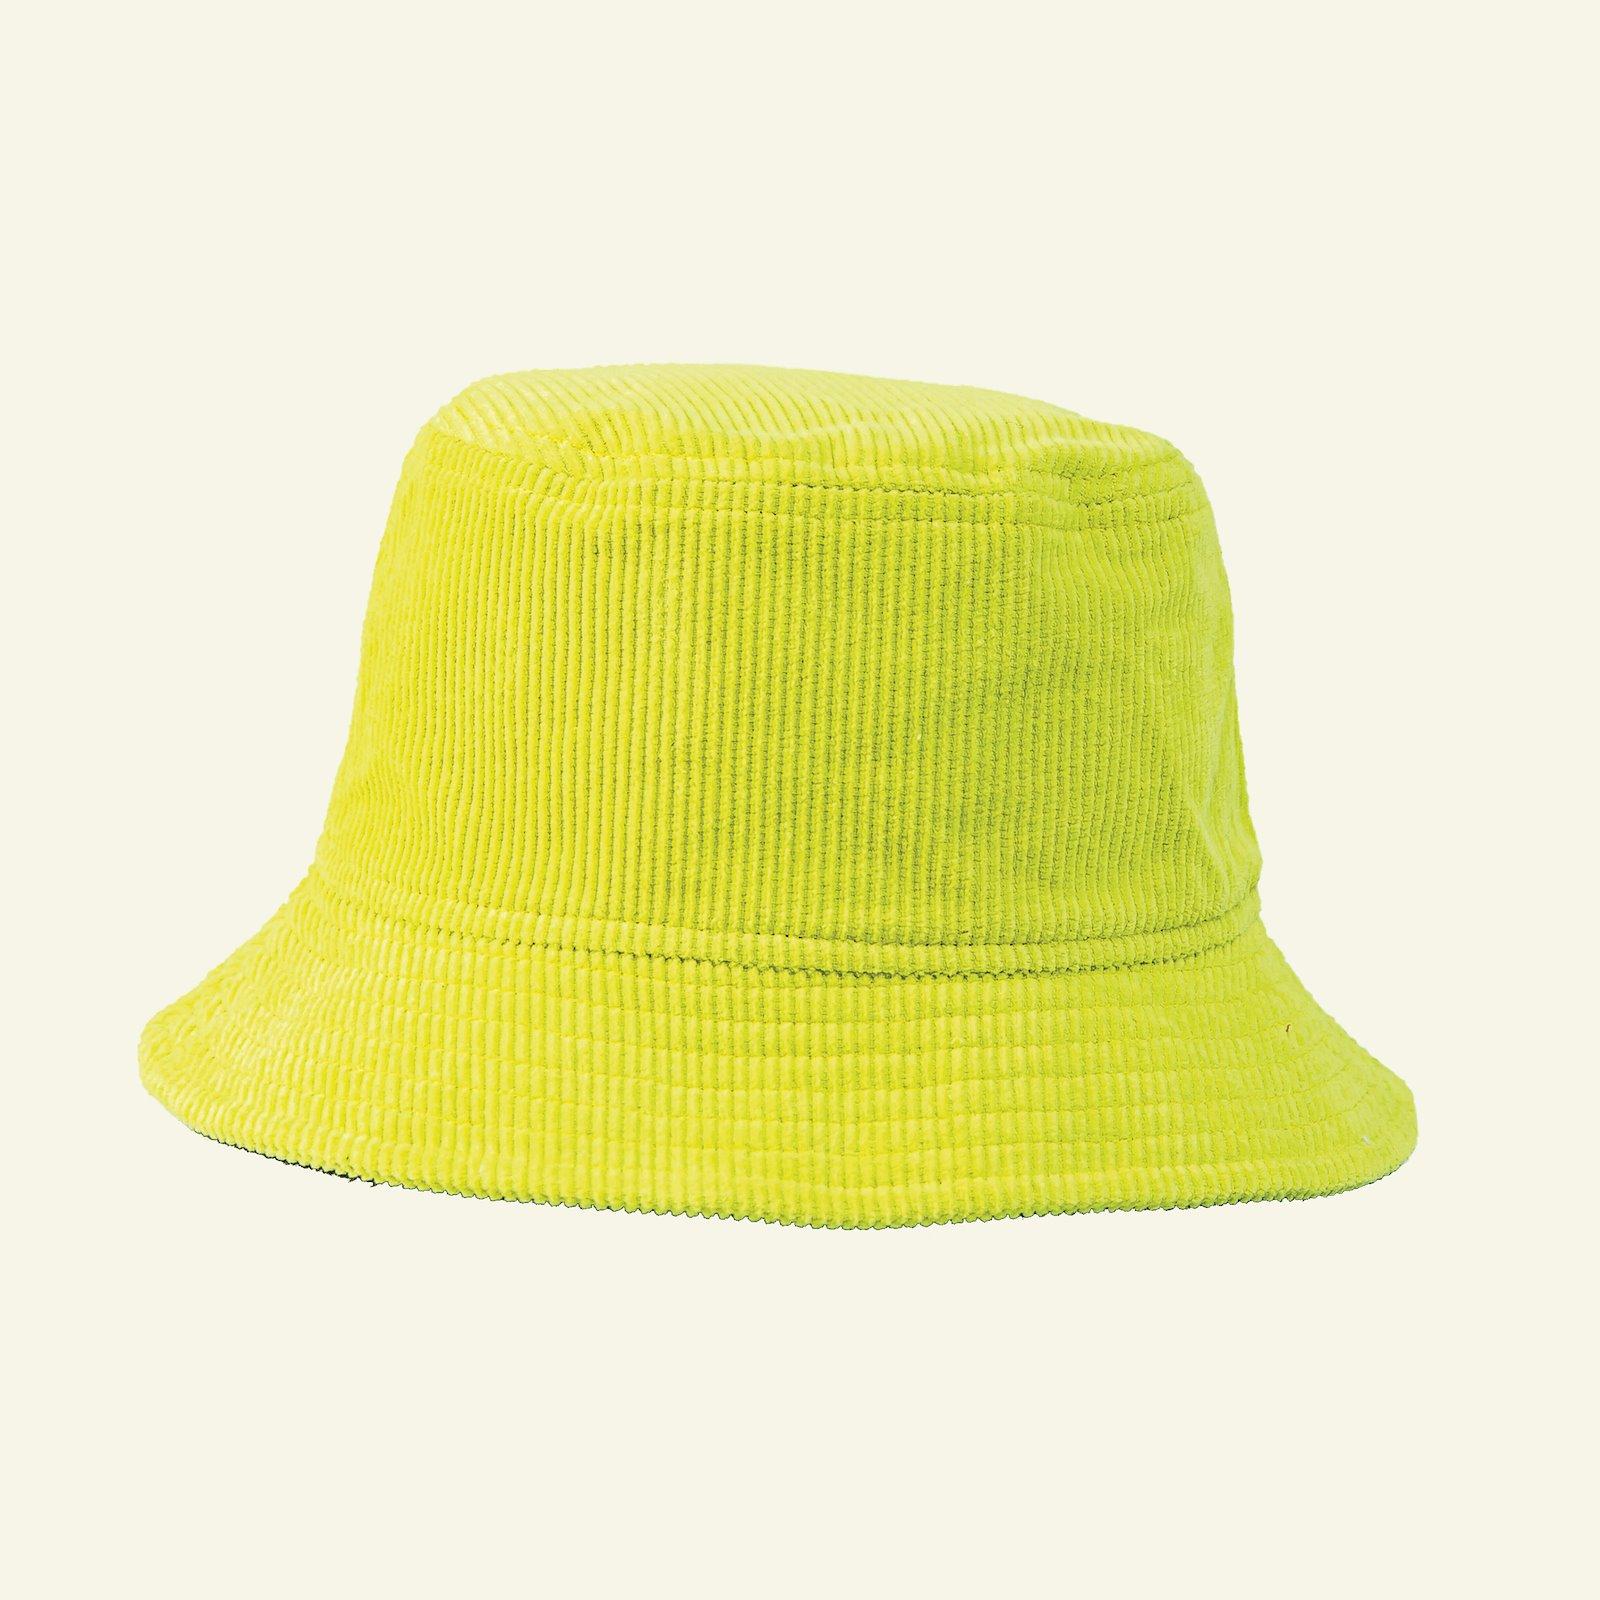 Corduroy 8 wales light lime p90325_430822_4322_sskit